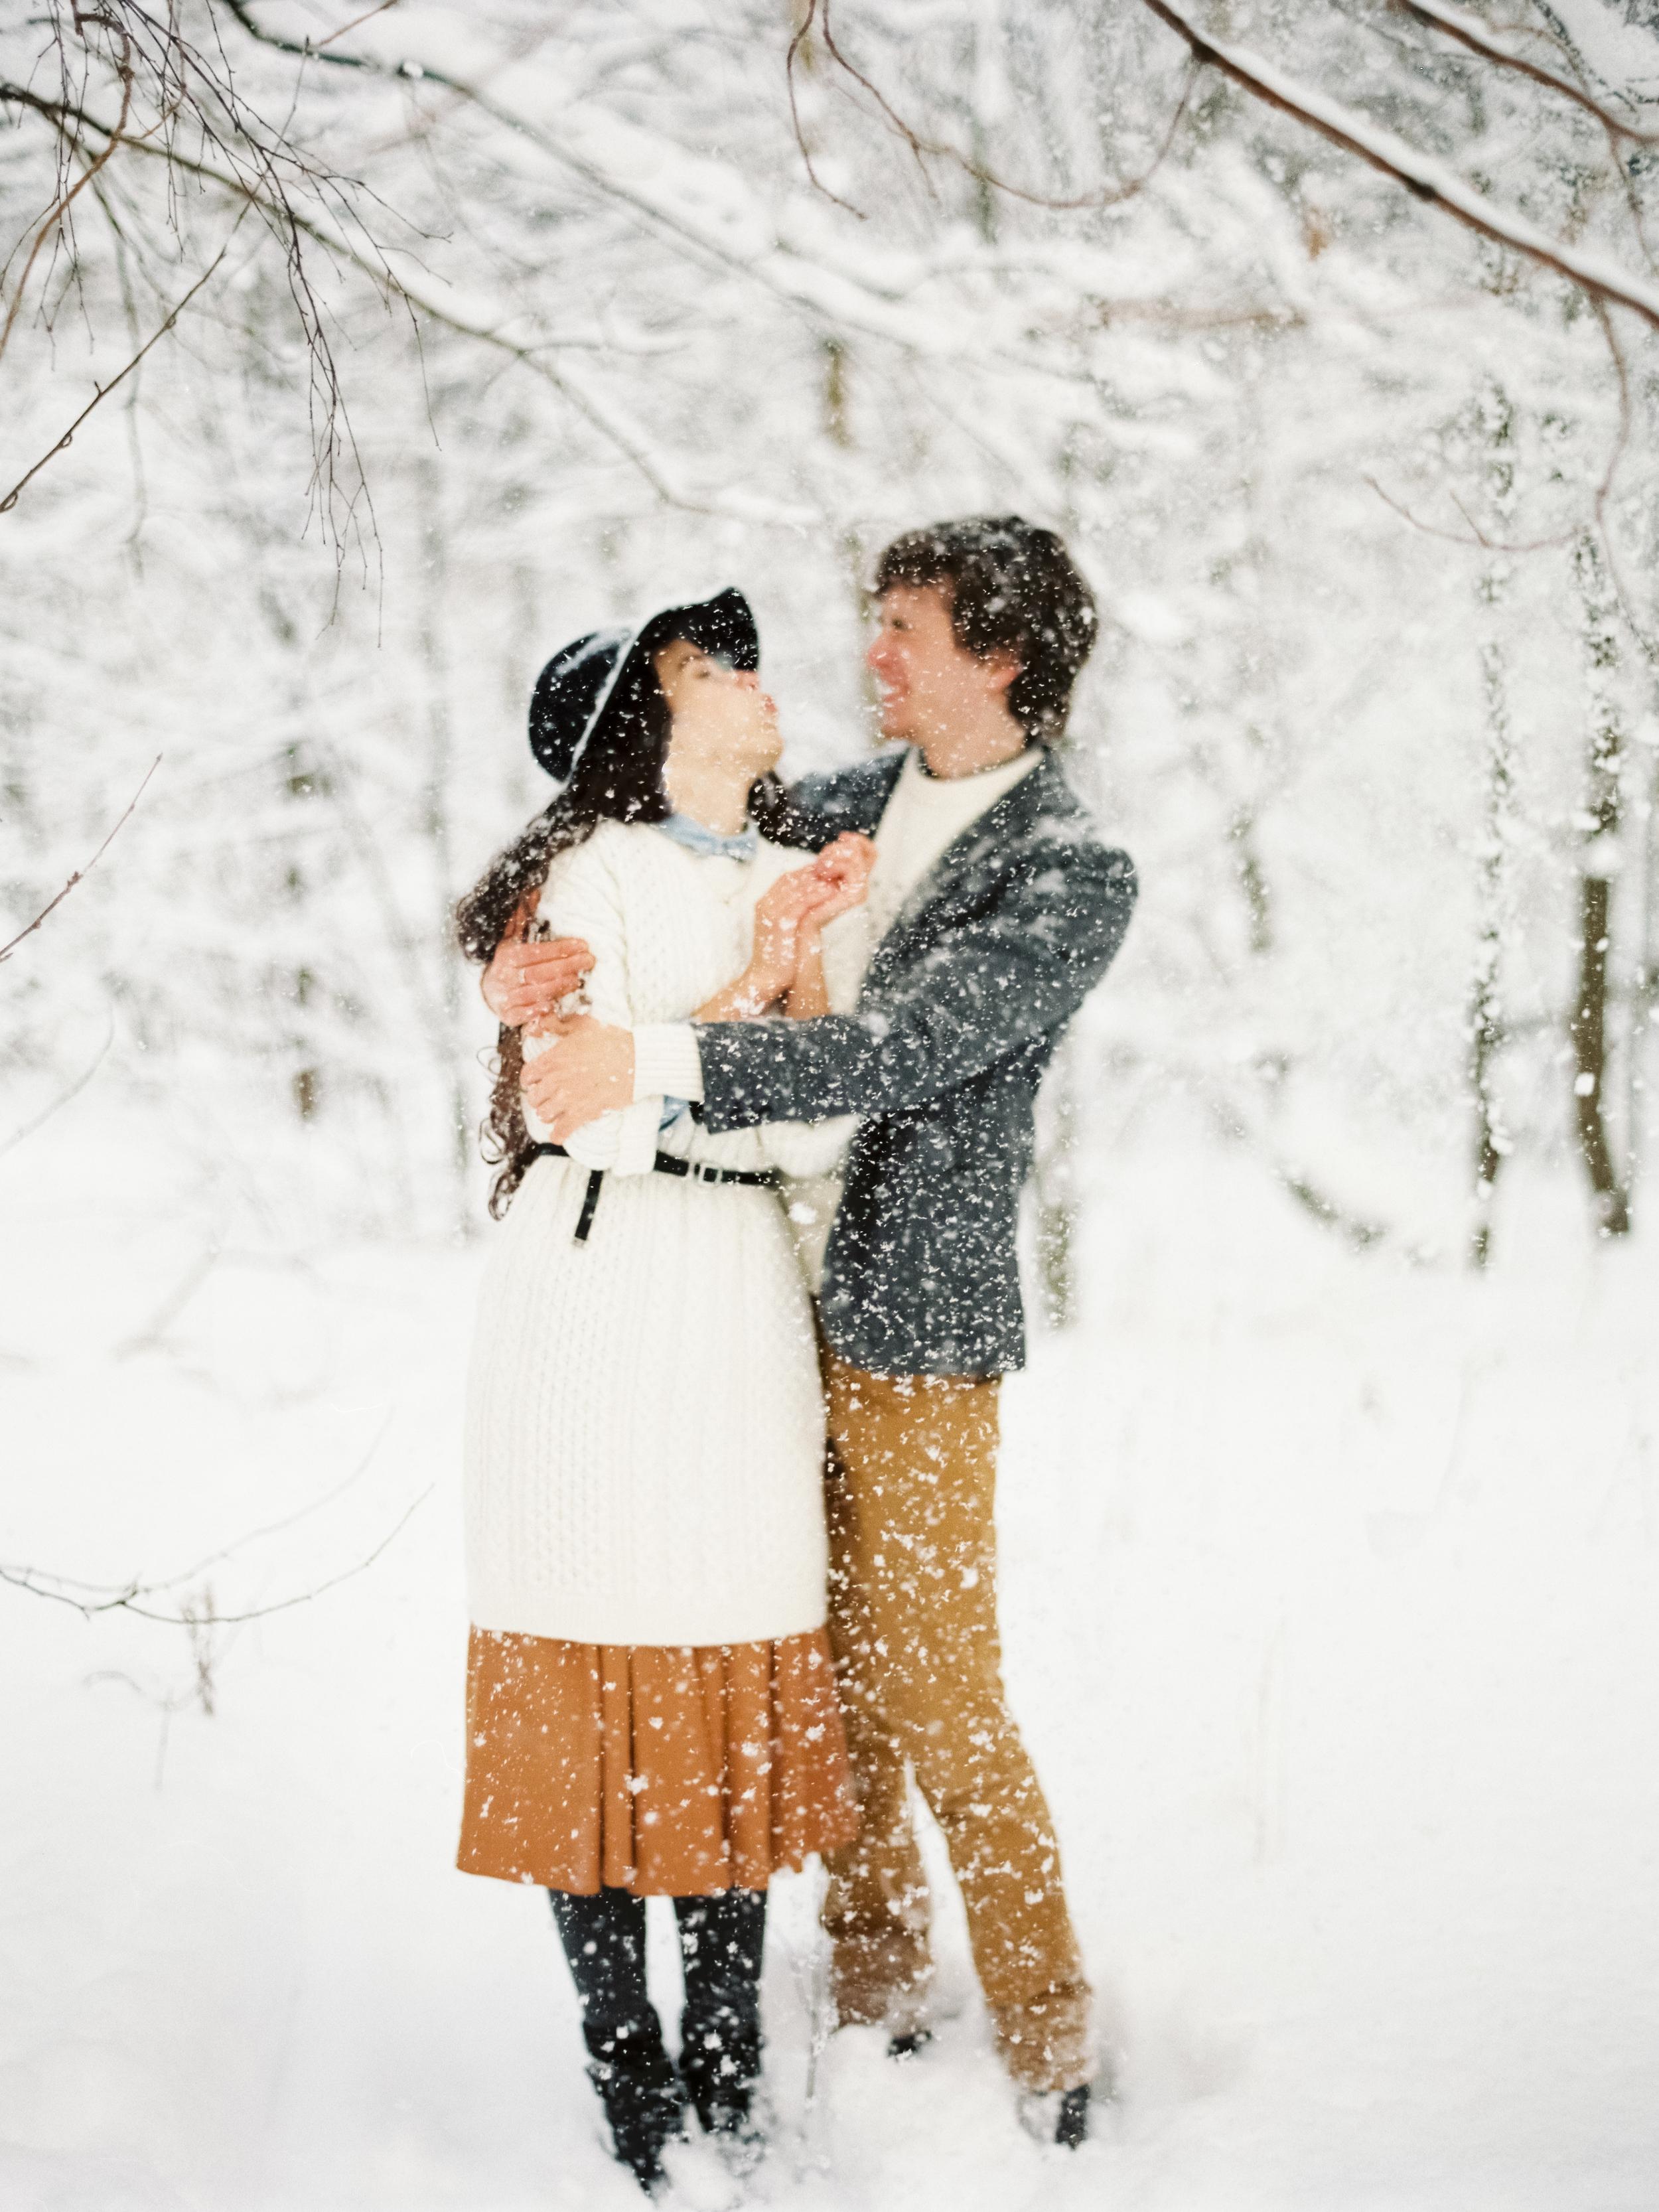 Tamara Gigola Photography winter shoot. Duet Postscriptum. Moscow. Russia. -0001-5-2.JPG